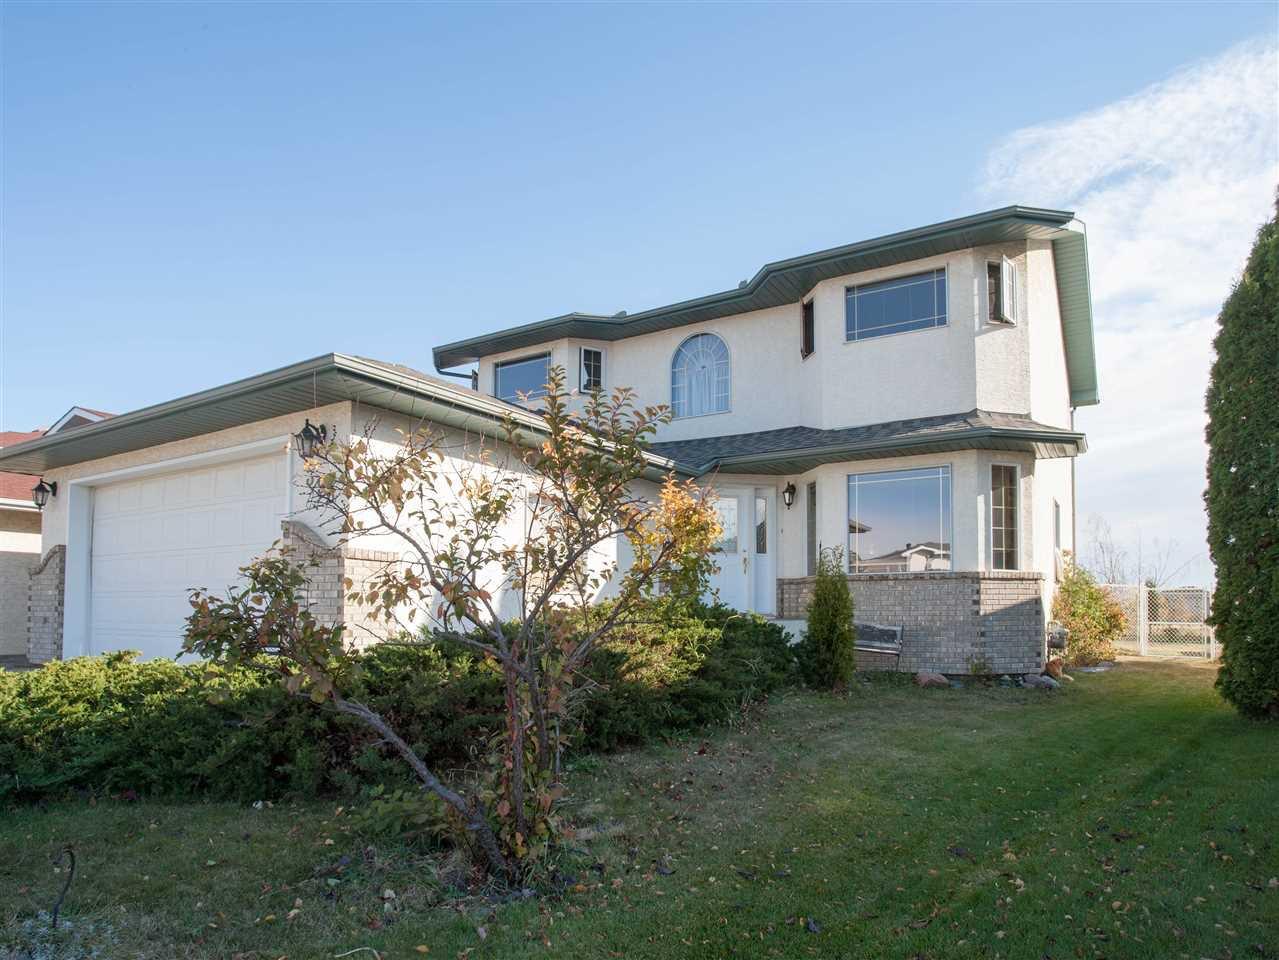 Main Photo: 396 HOLLICK-KENYON Road in Edmonton: Zone 03 House for sale : MLS®# E4217912